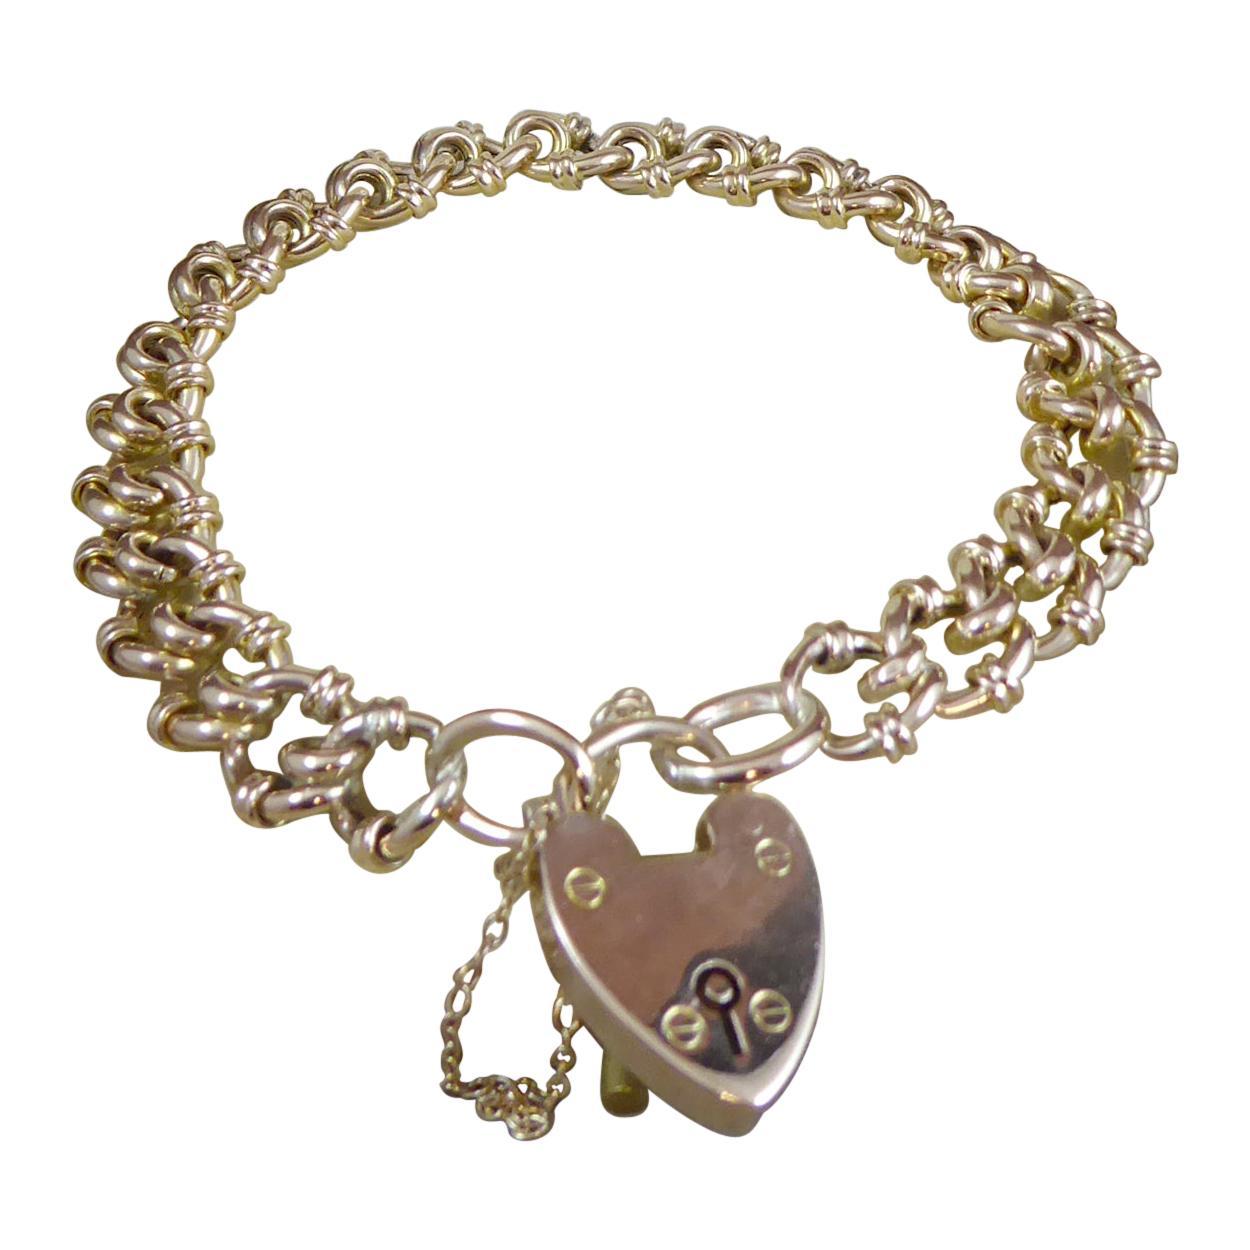 Antique Gold Bracelet with Padlock Hallmarked, Birmingham, 1901